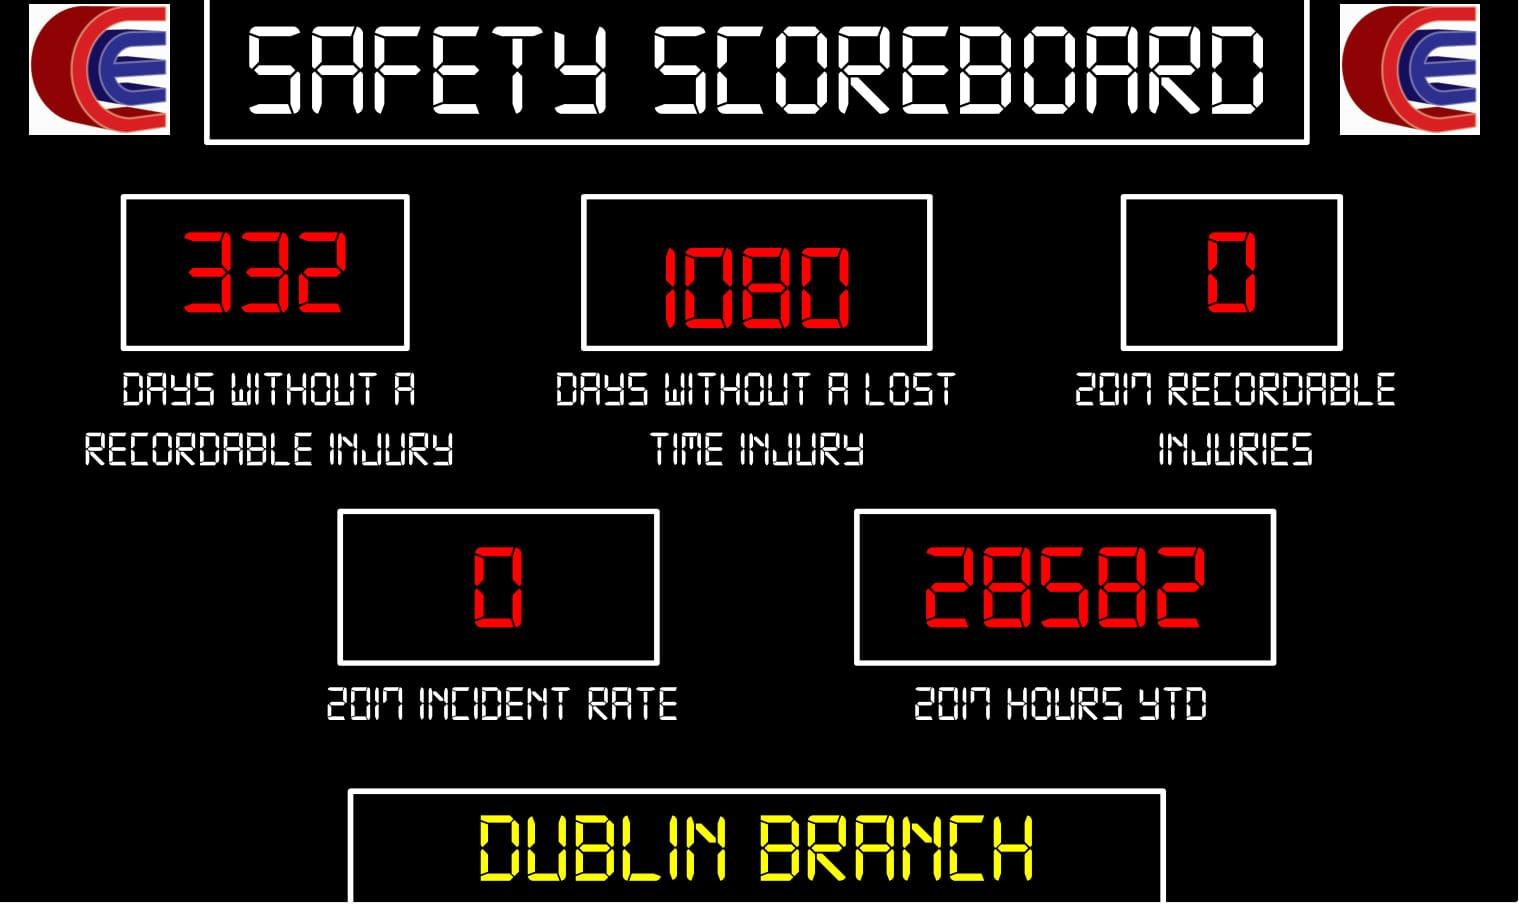 Safety Scoreboard-3